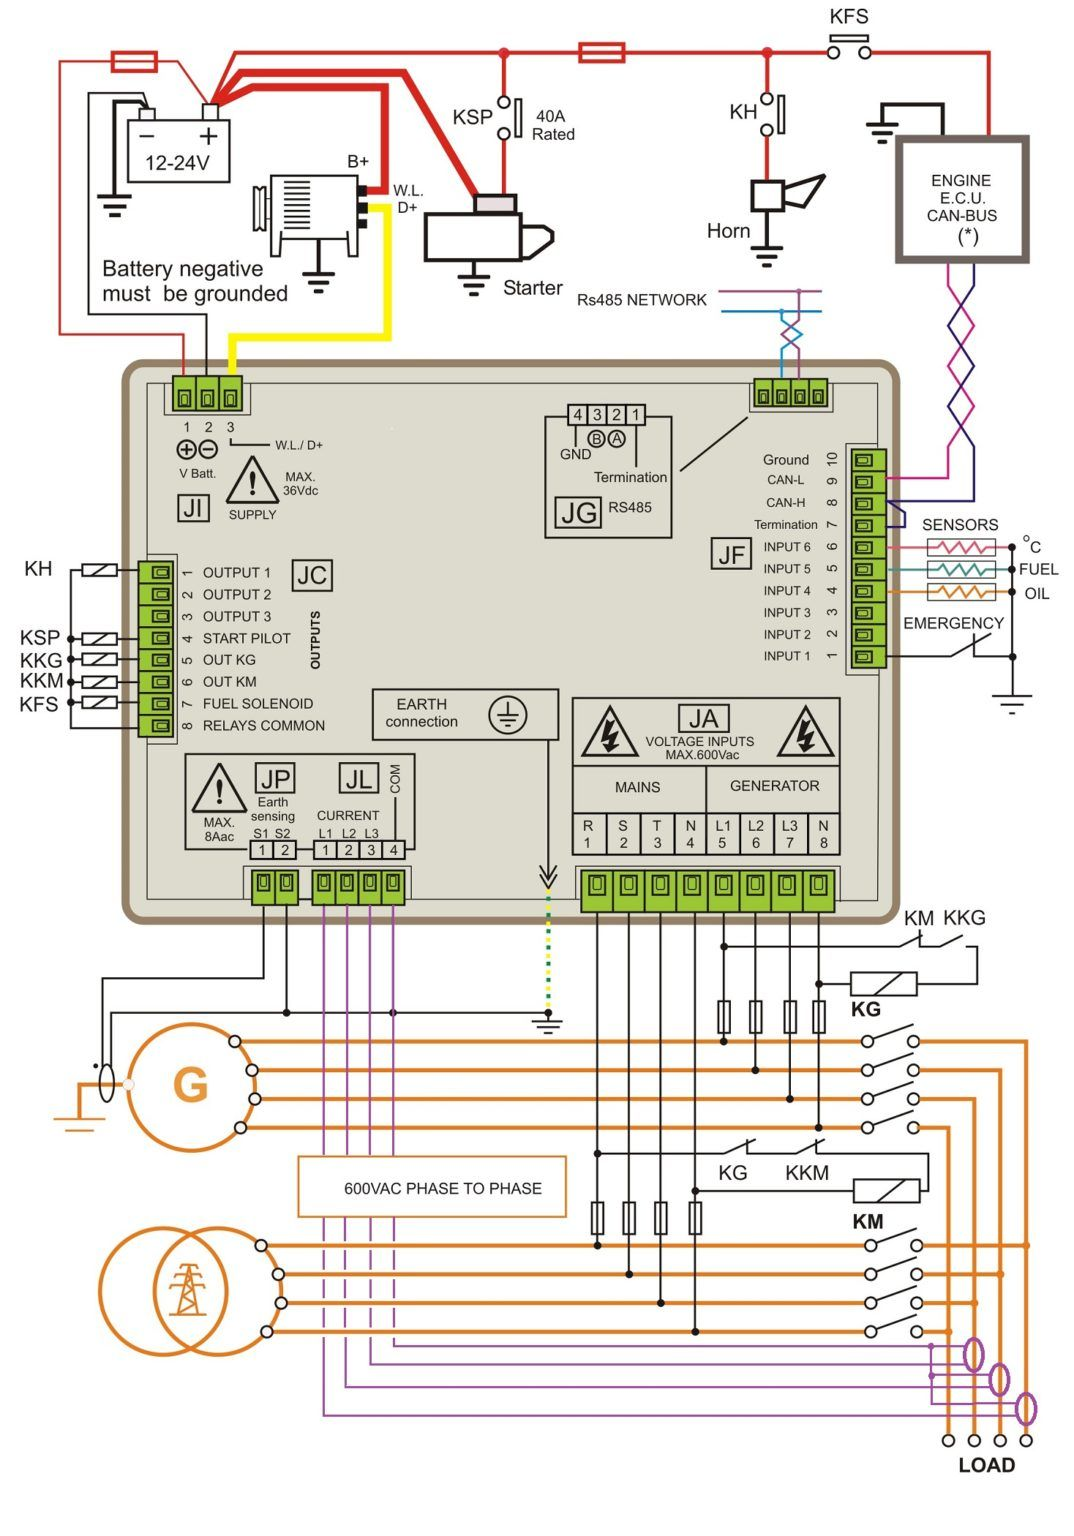 Bek3 Diesel Generator Control Panel Wiring Diagram Teknik Listrik Listrik Teknik